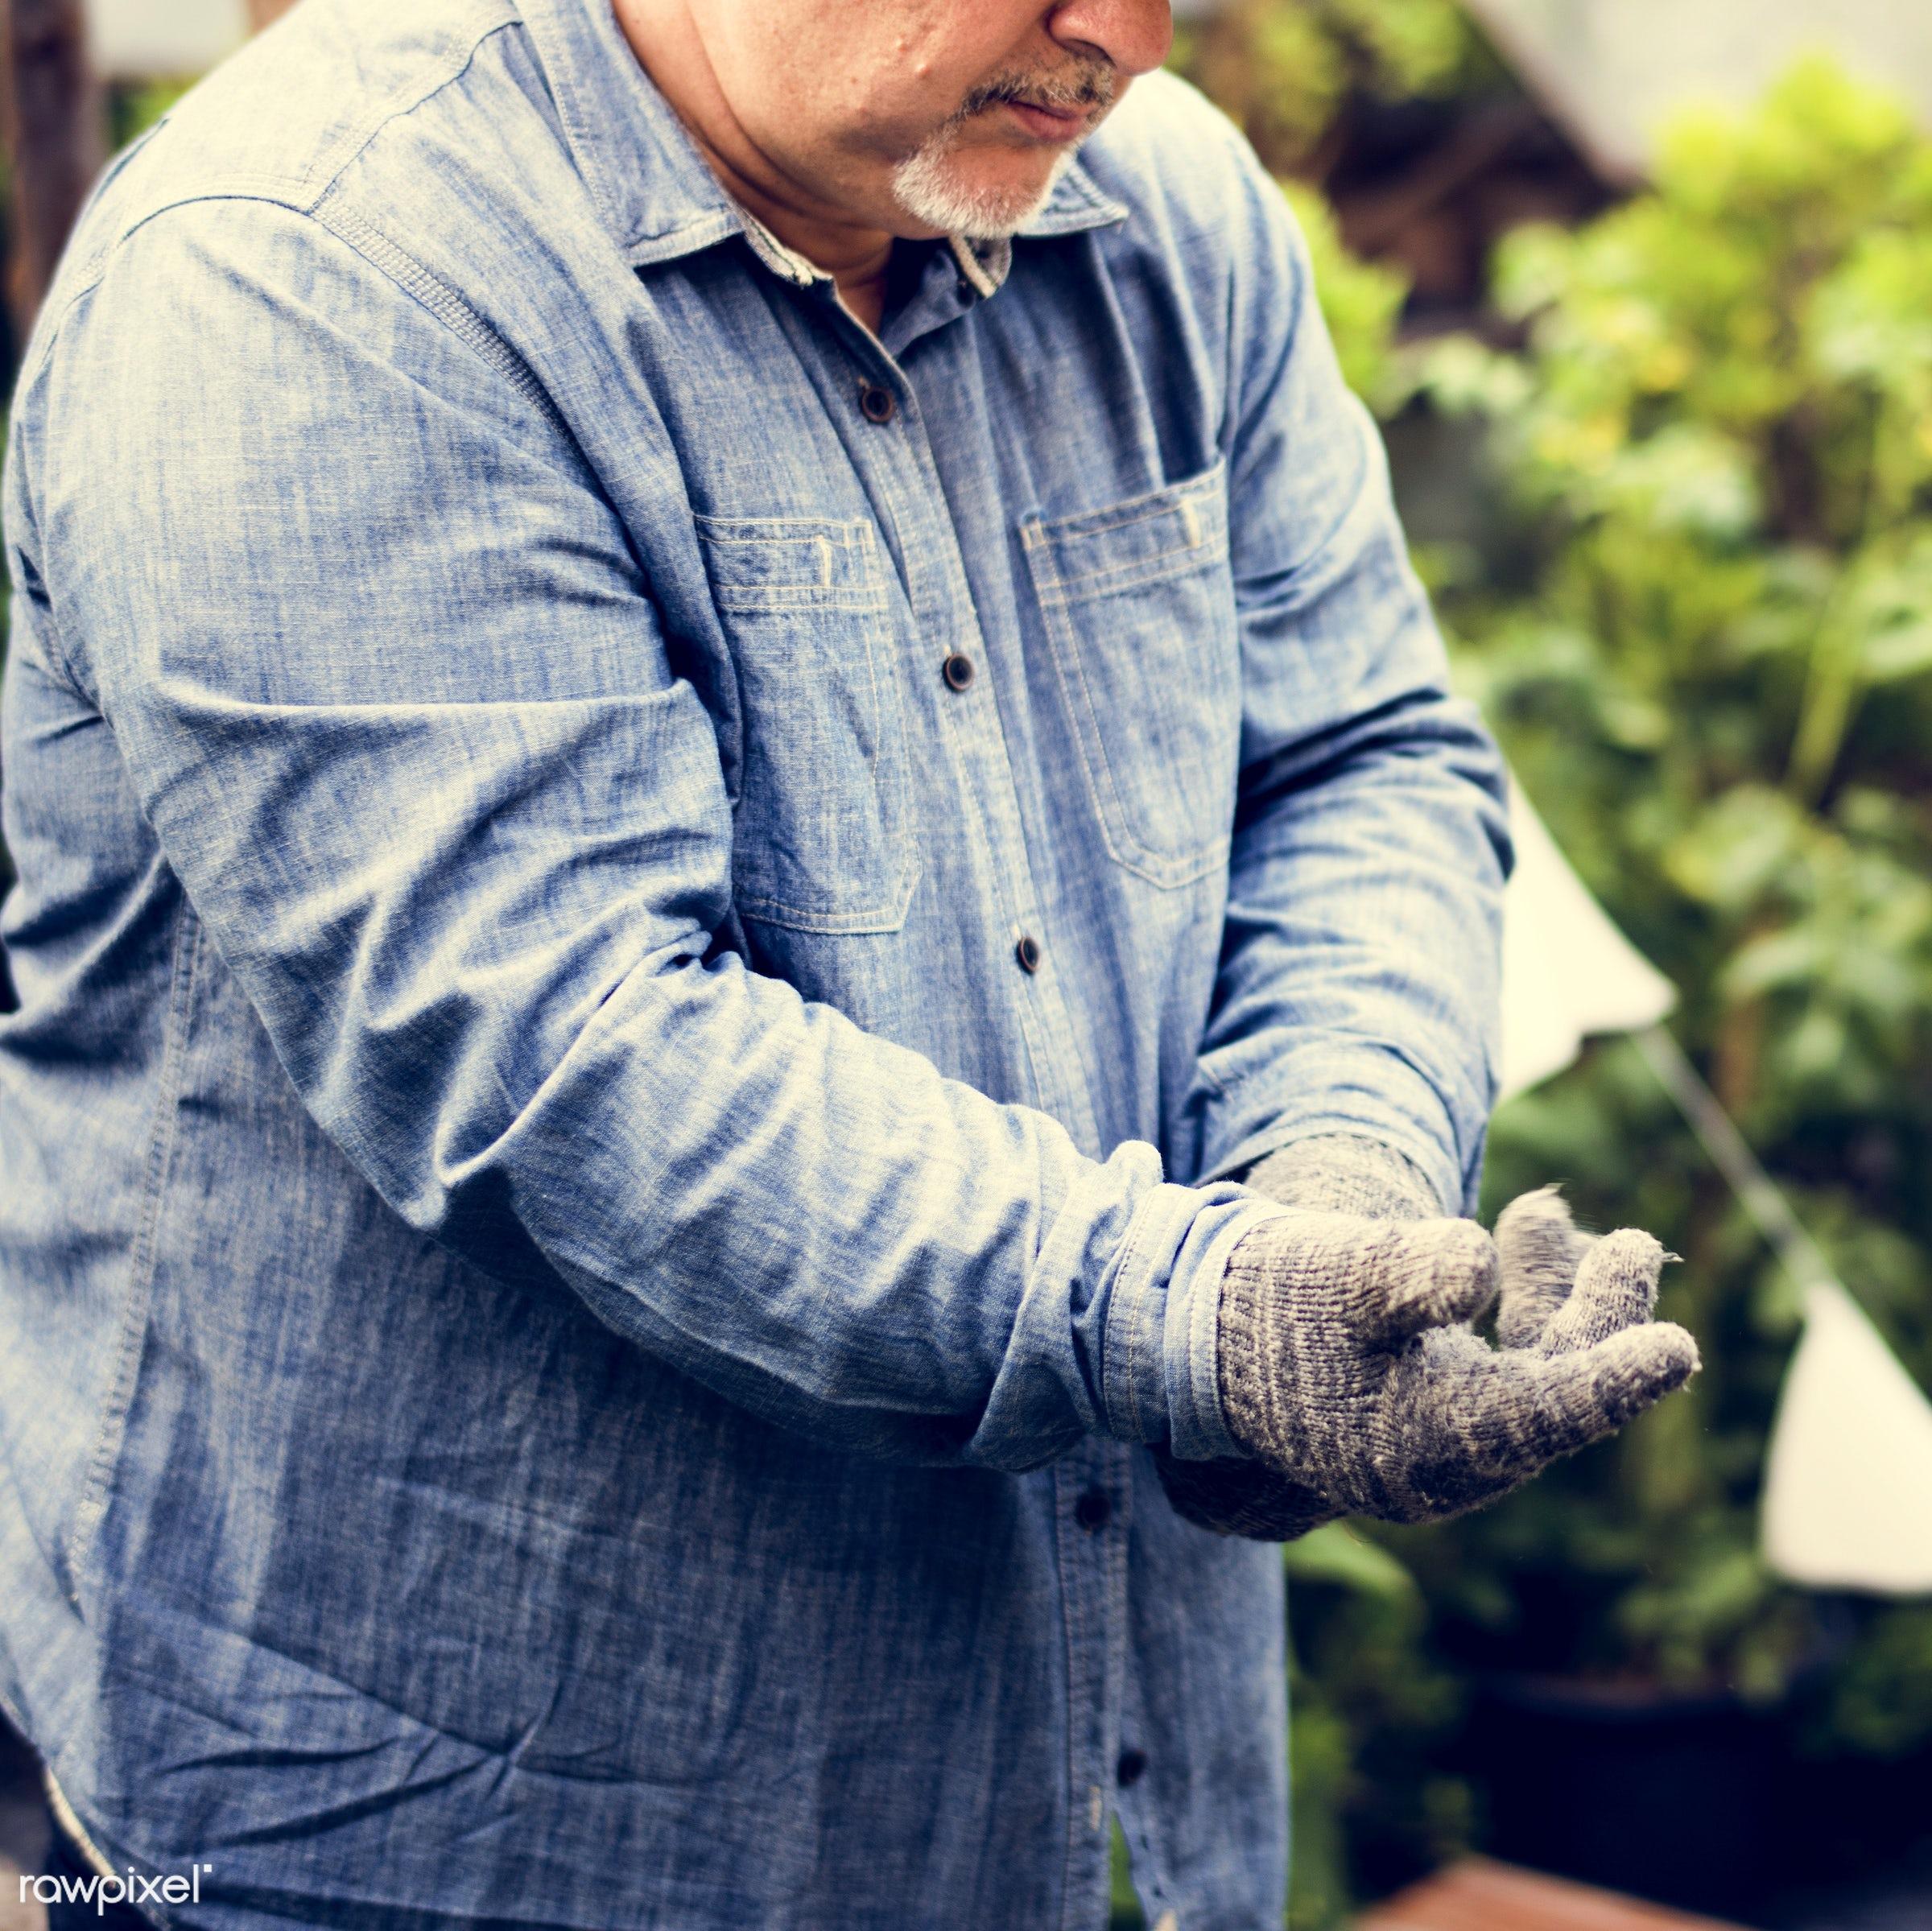 plant, holding, ground, plantation, spring, farm, hand, farmland, farmer, green, agriculture, planting, gloves, growing,...